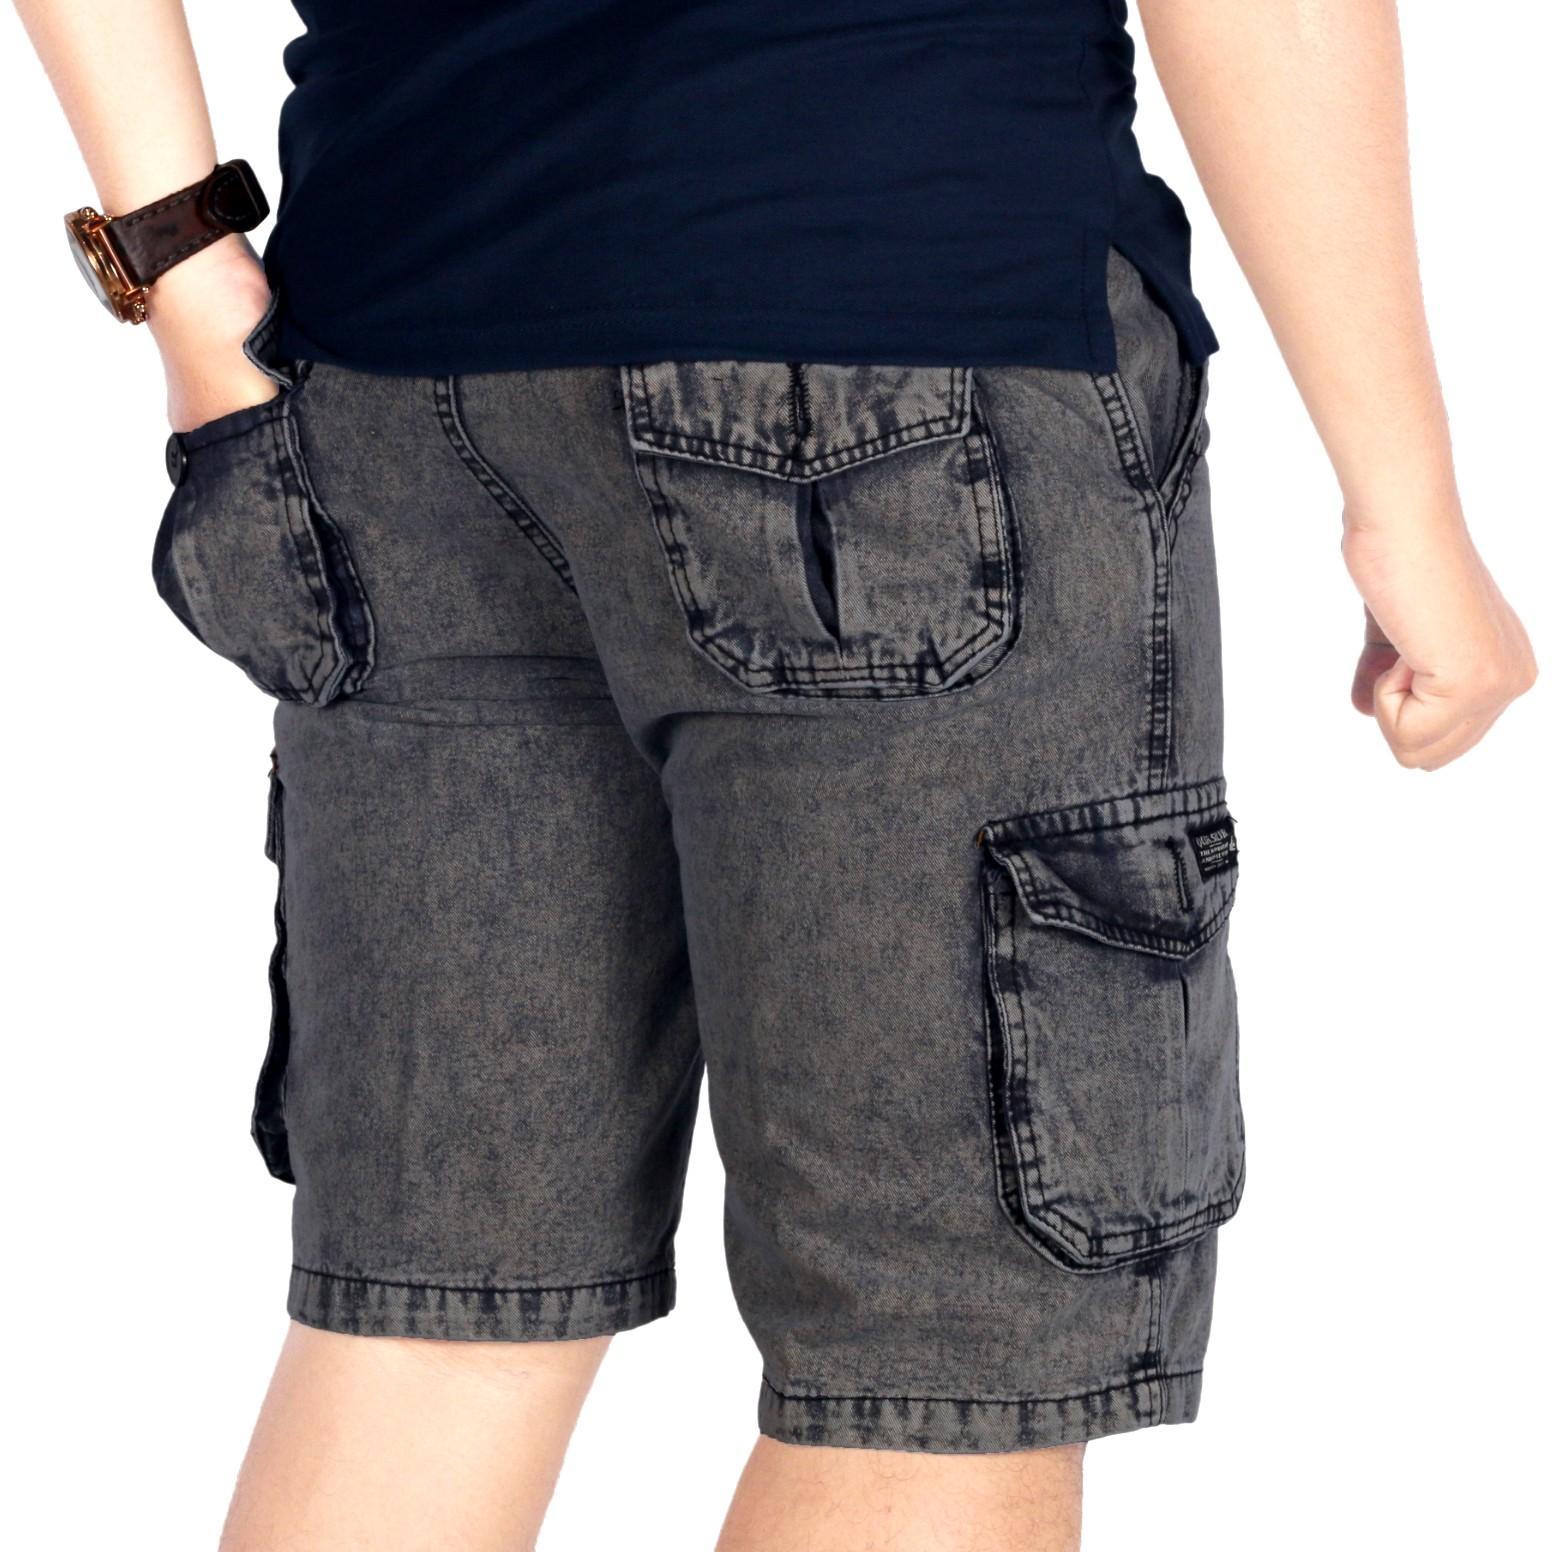 BSG Fashion1 Celana Pendek Polos Navy Distro  Celana Skinny Celana Pants  Celana Santai  be12da6652